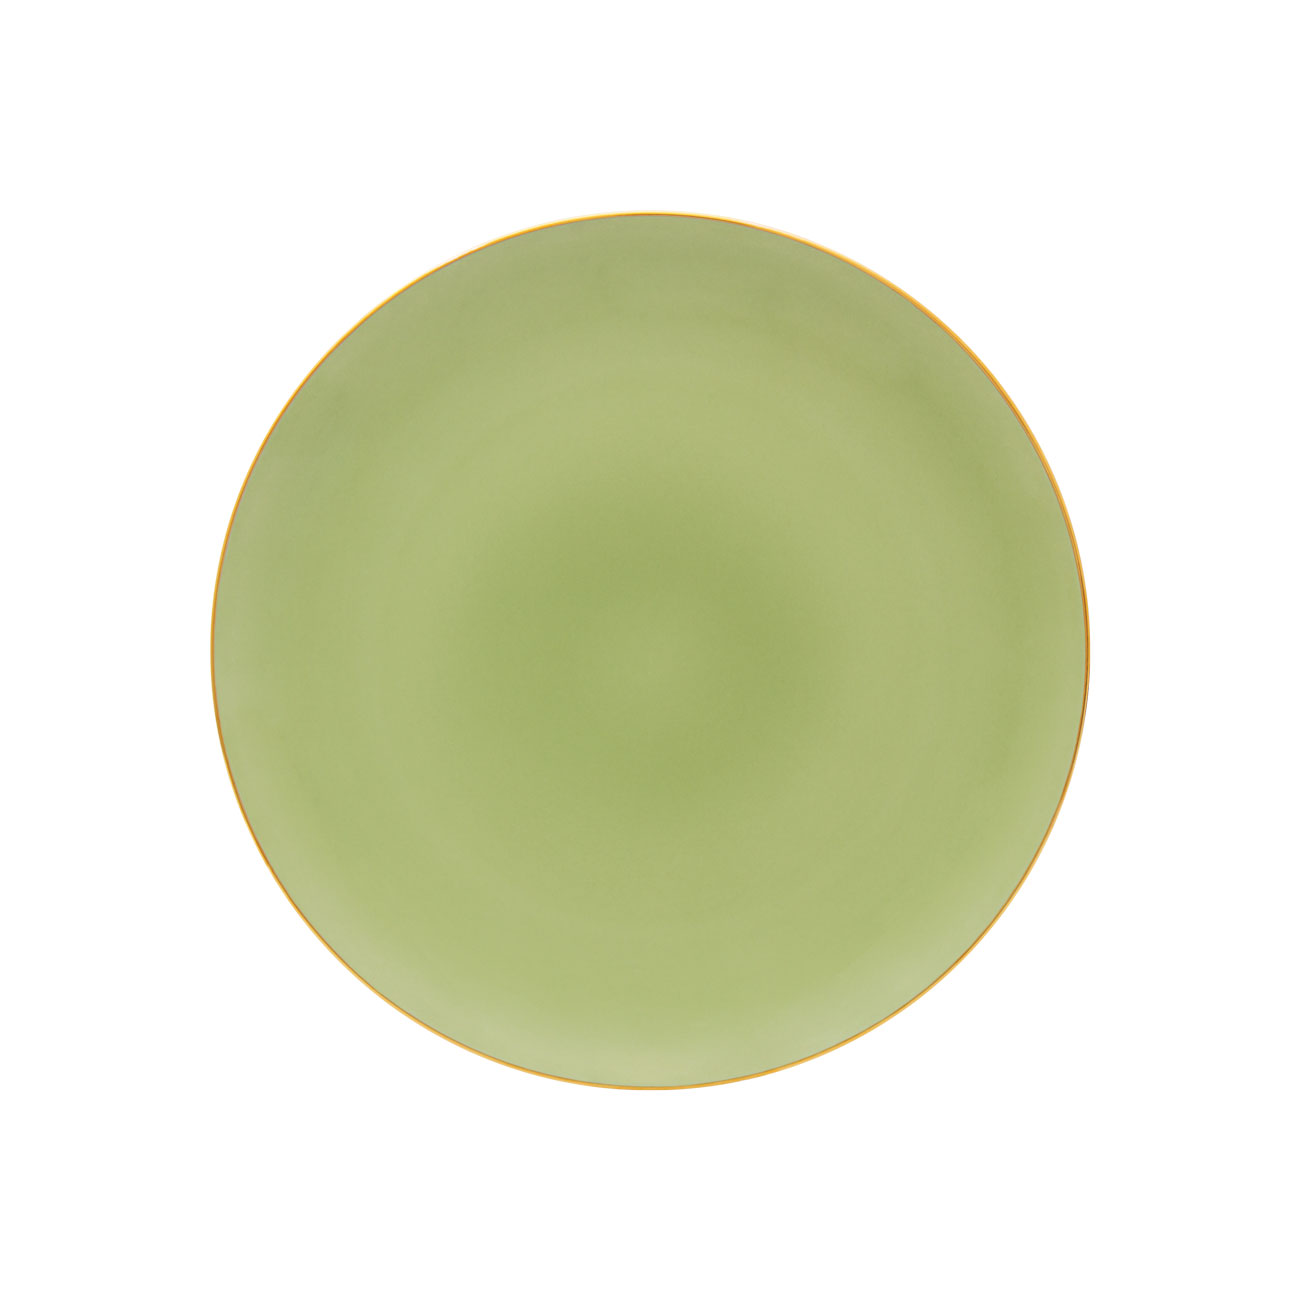 Dinner Plate 27cm Peac 1